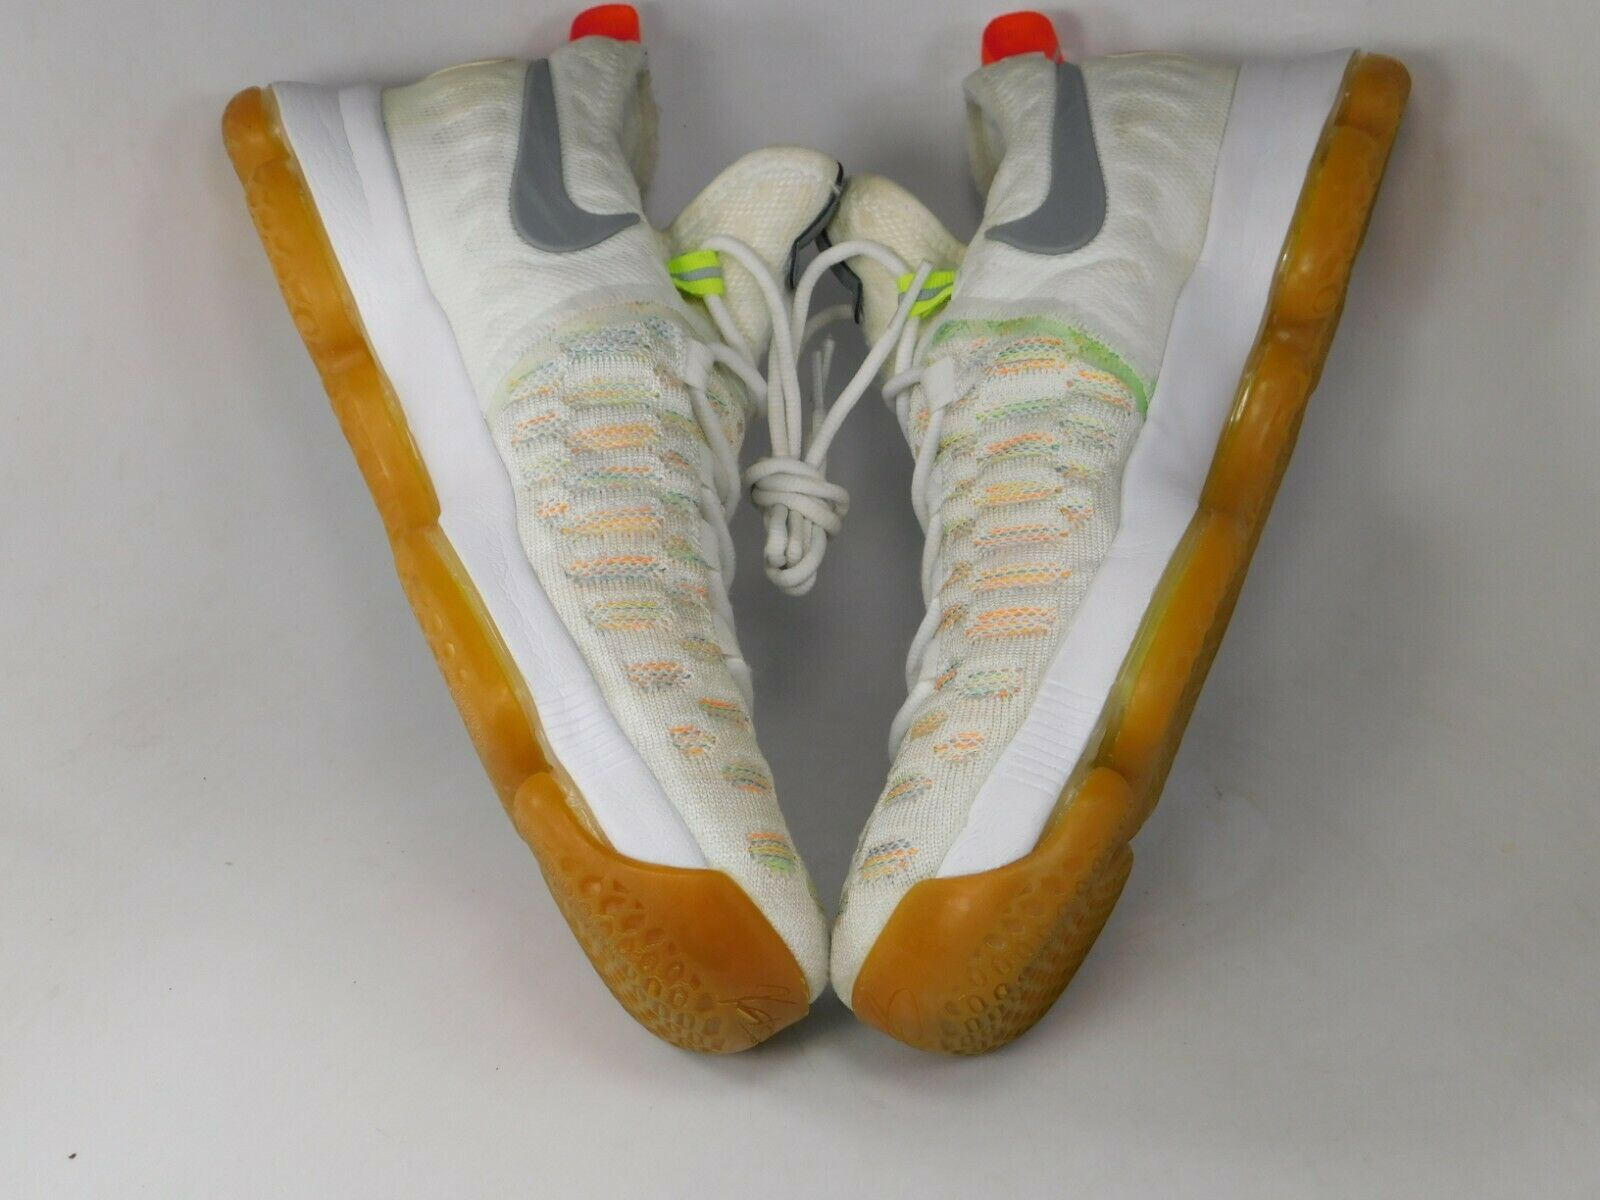 Nike Zoom KD 9 IX Size US 10 M (D) EU 44 Men's Basketball Shoes Multi 843392-900 image 6